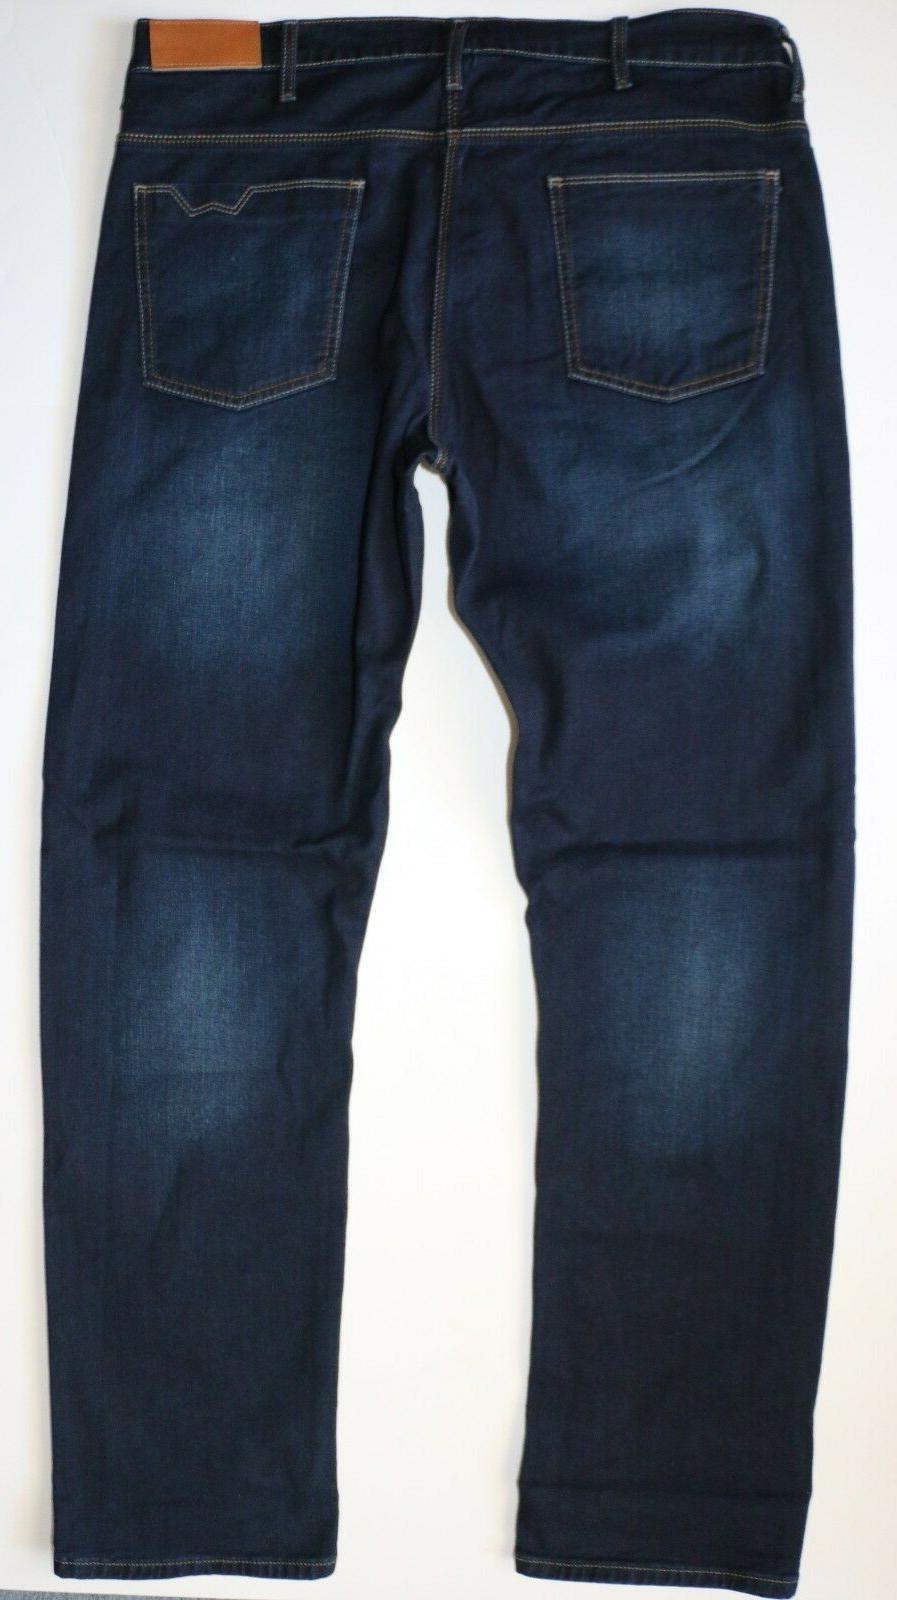 New Flex Straight Fit Jeans Denim Men's Sizes